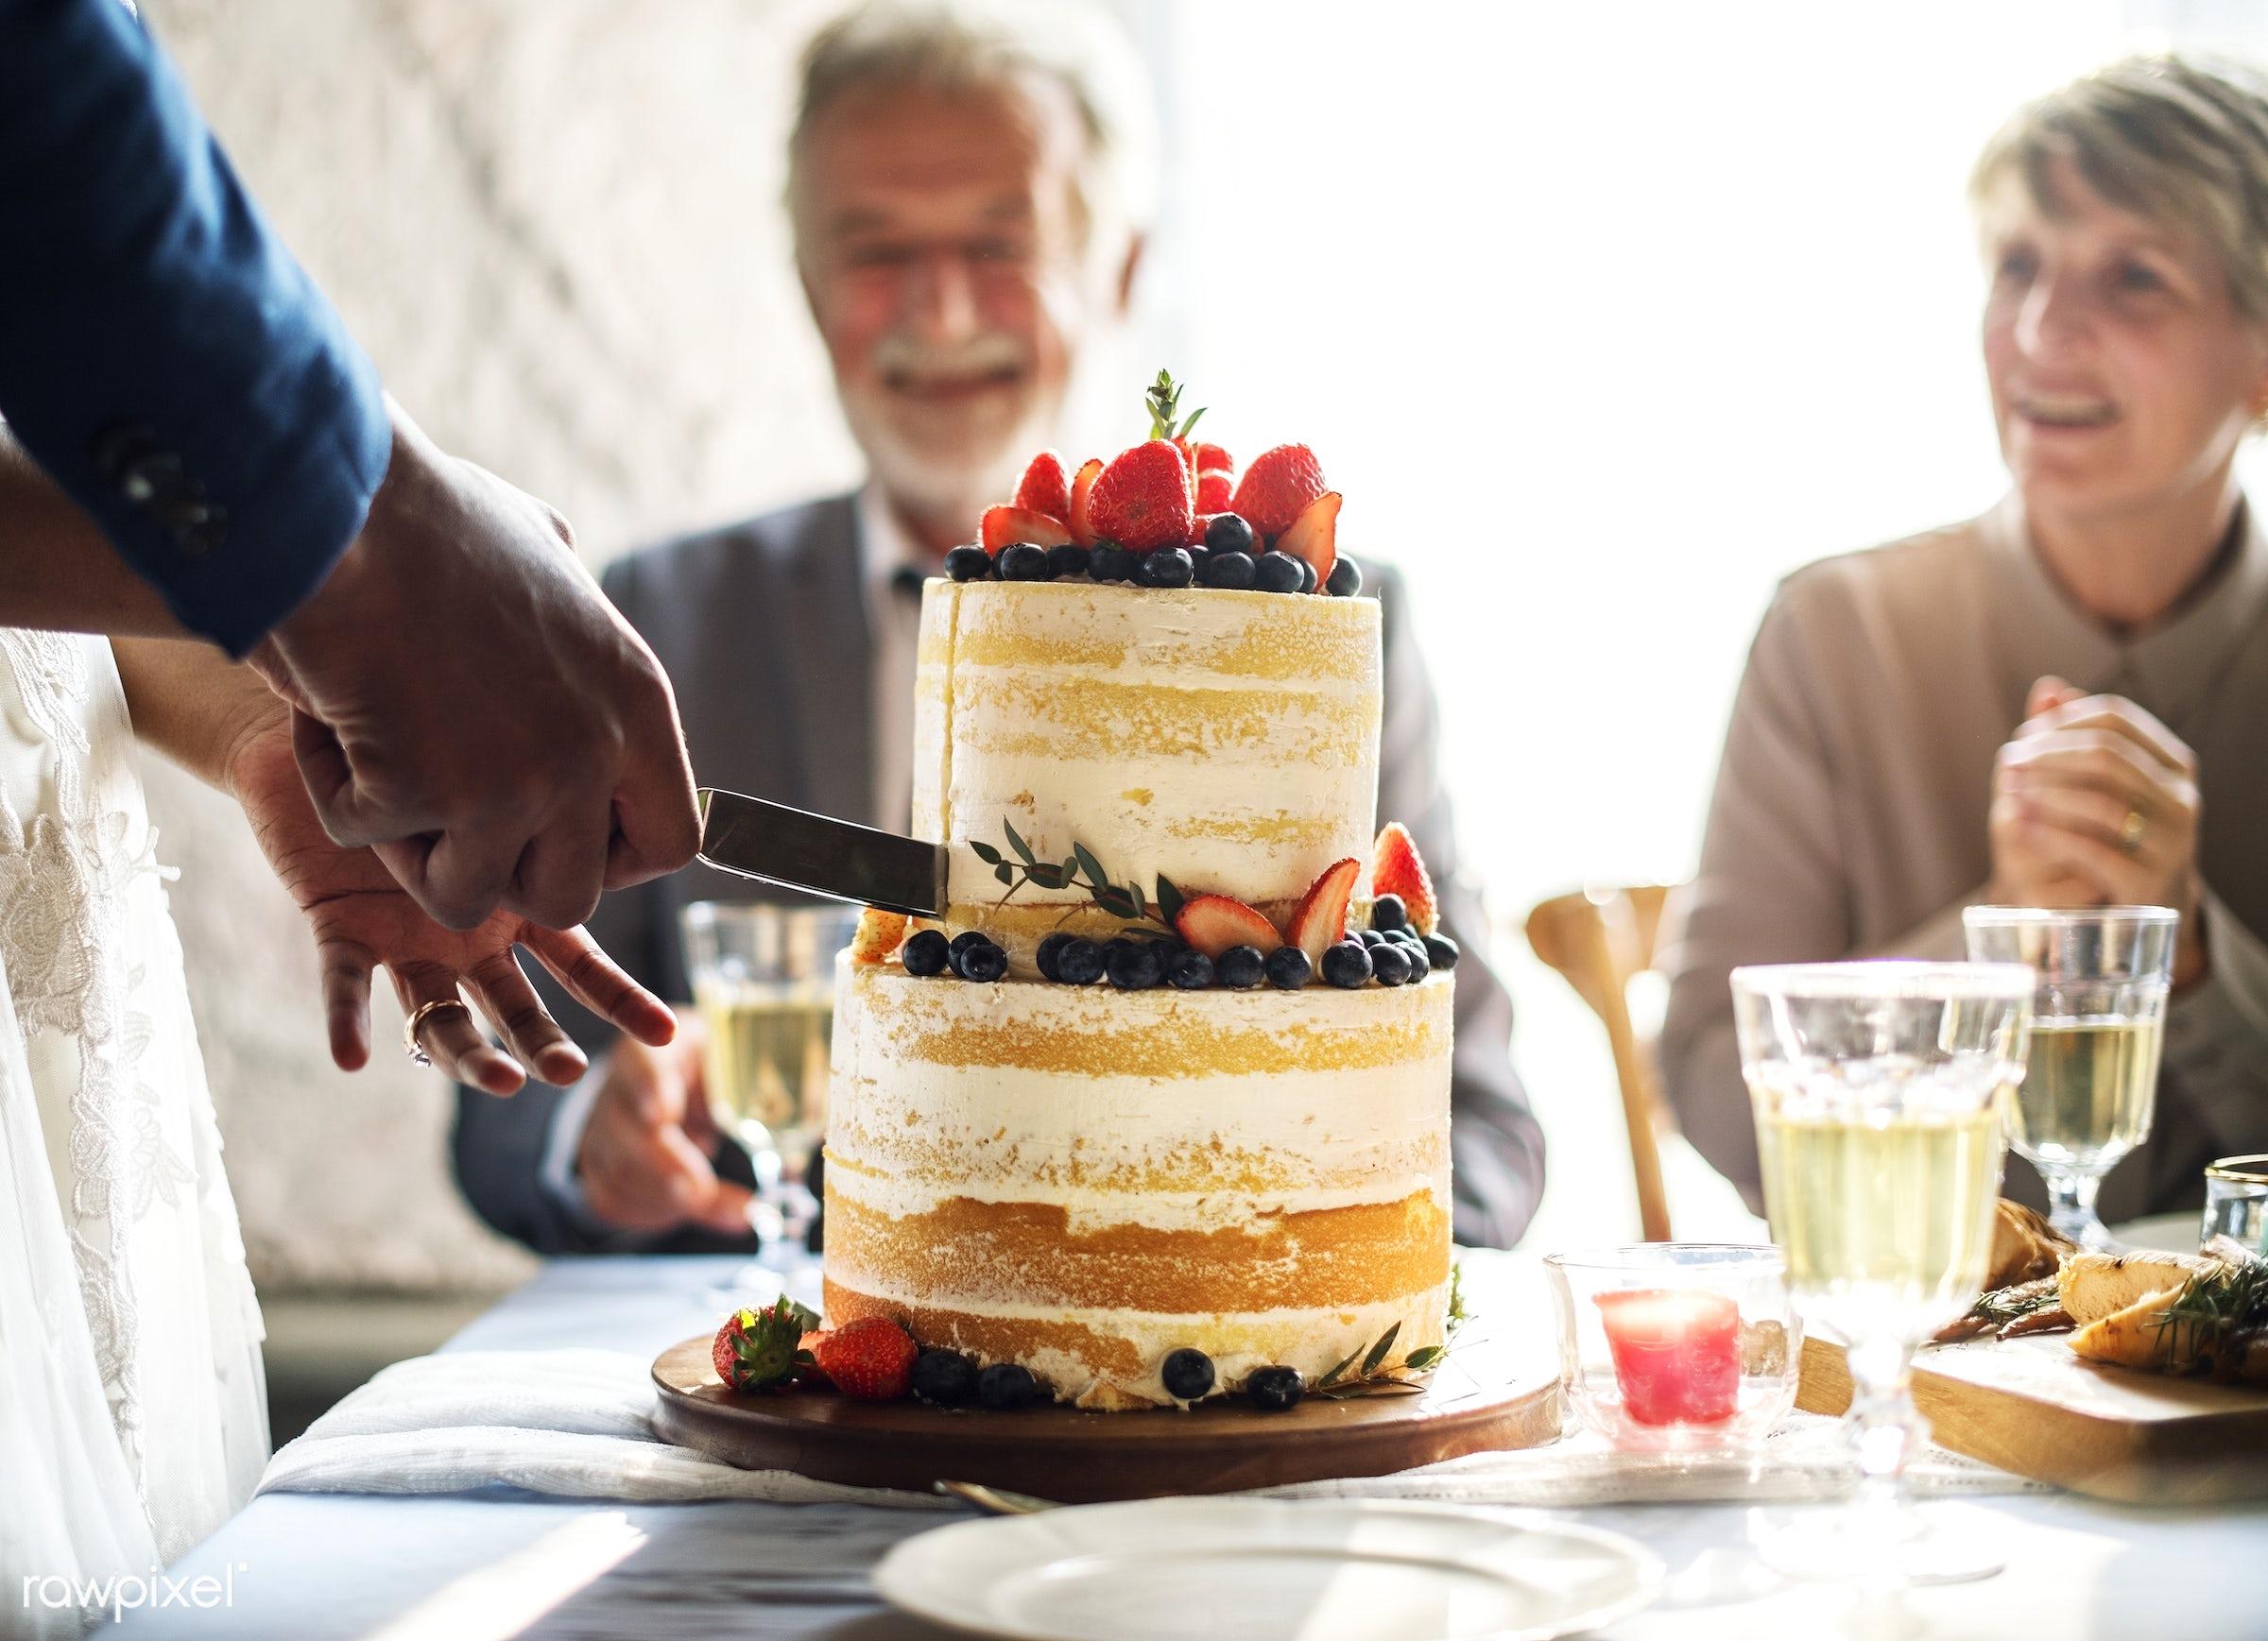 cake, berries, celebrate, celebration, congrats, congratulations, couple, cut, dessert, diversity, elegance, friends, gather...